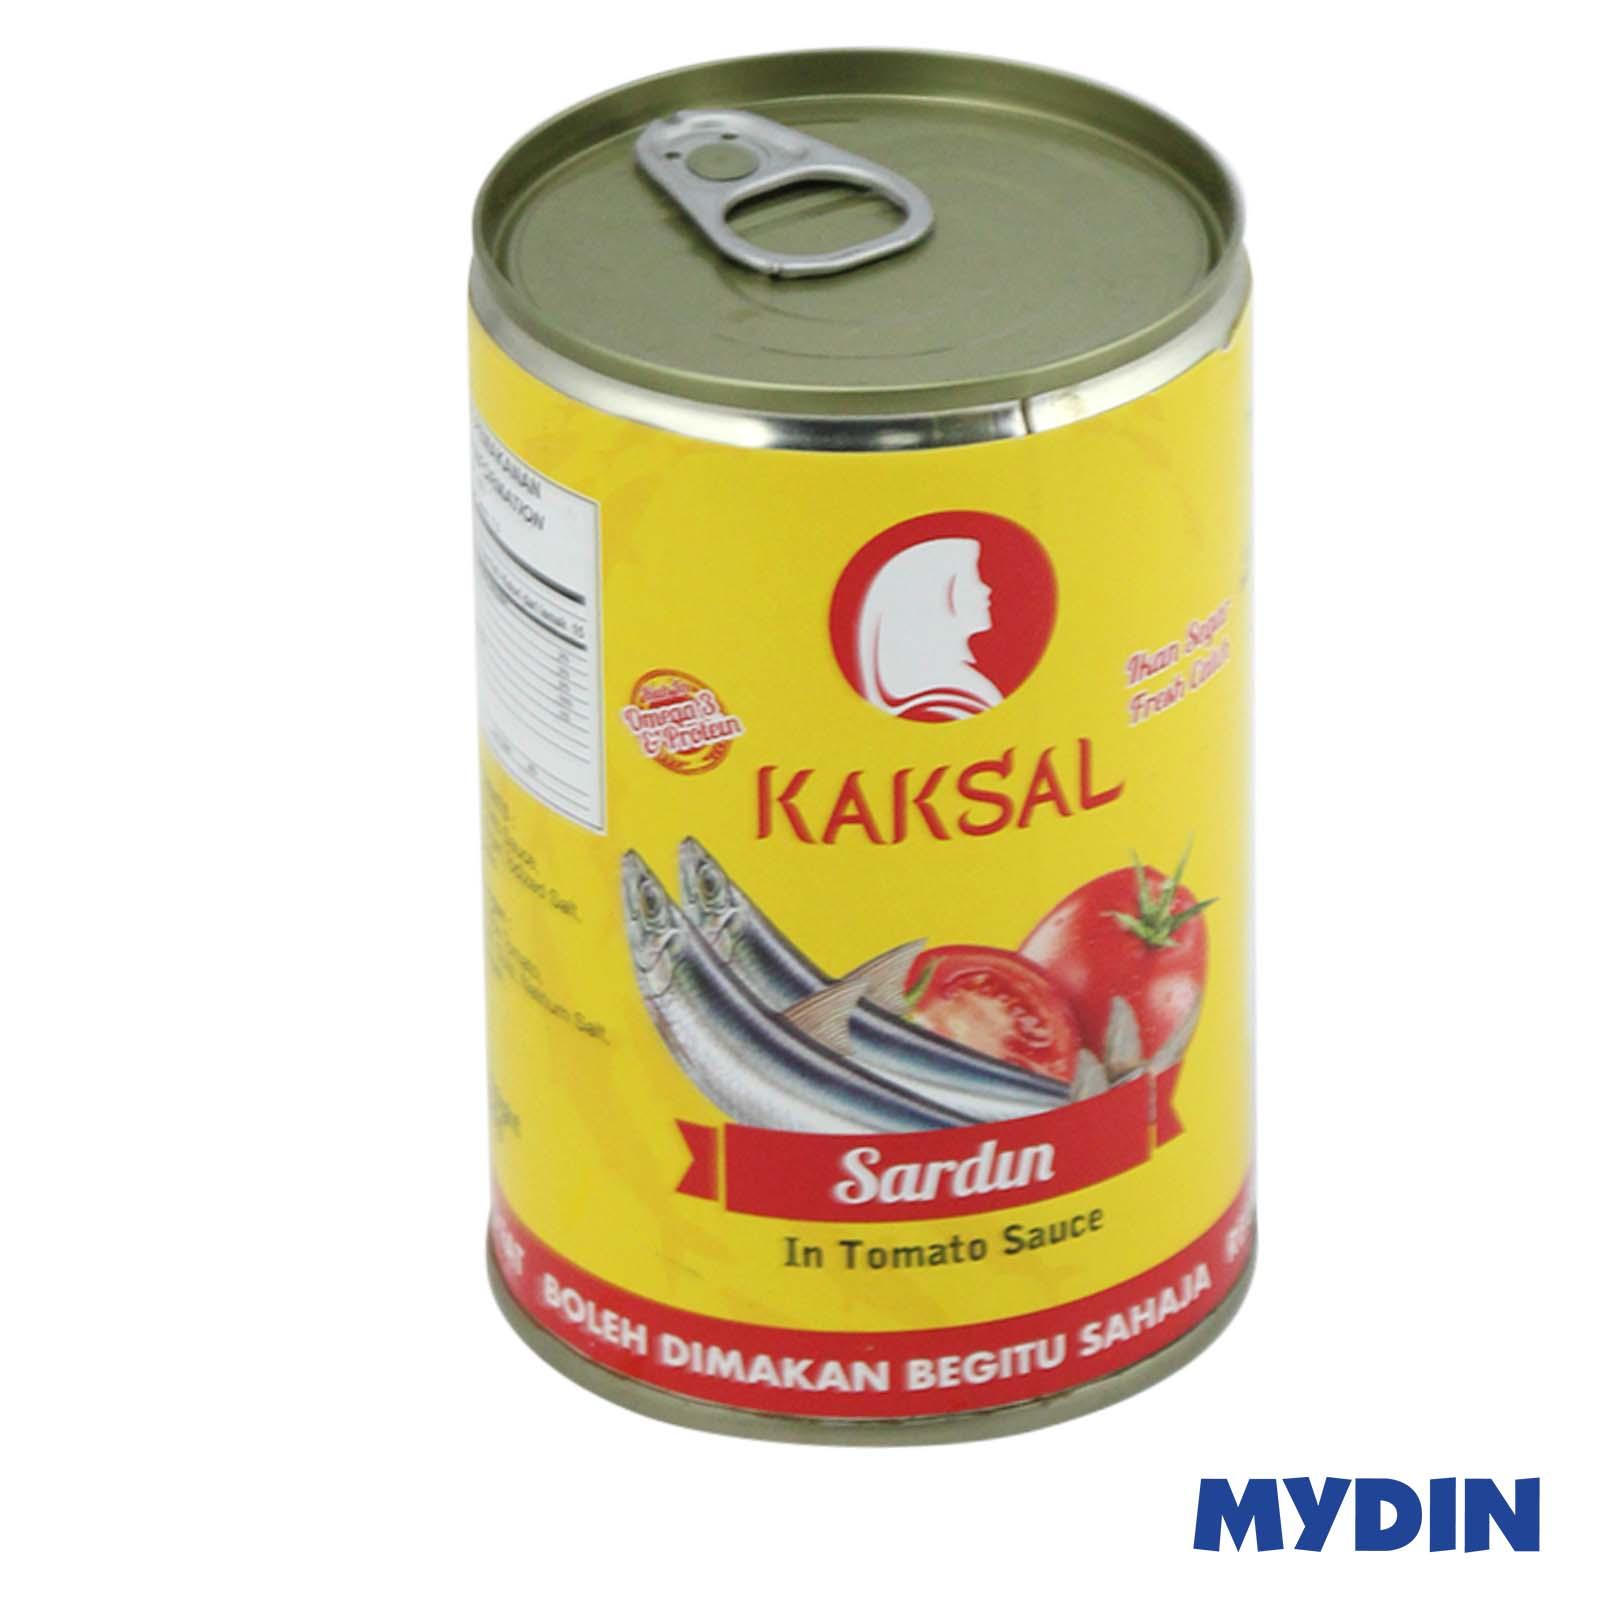 Kak Sal Sardine in Tomato Sauce (425g)